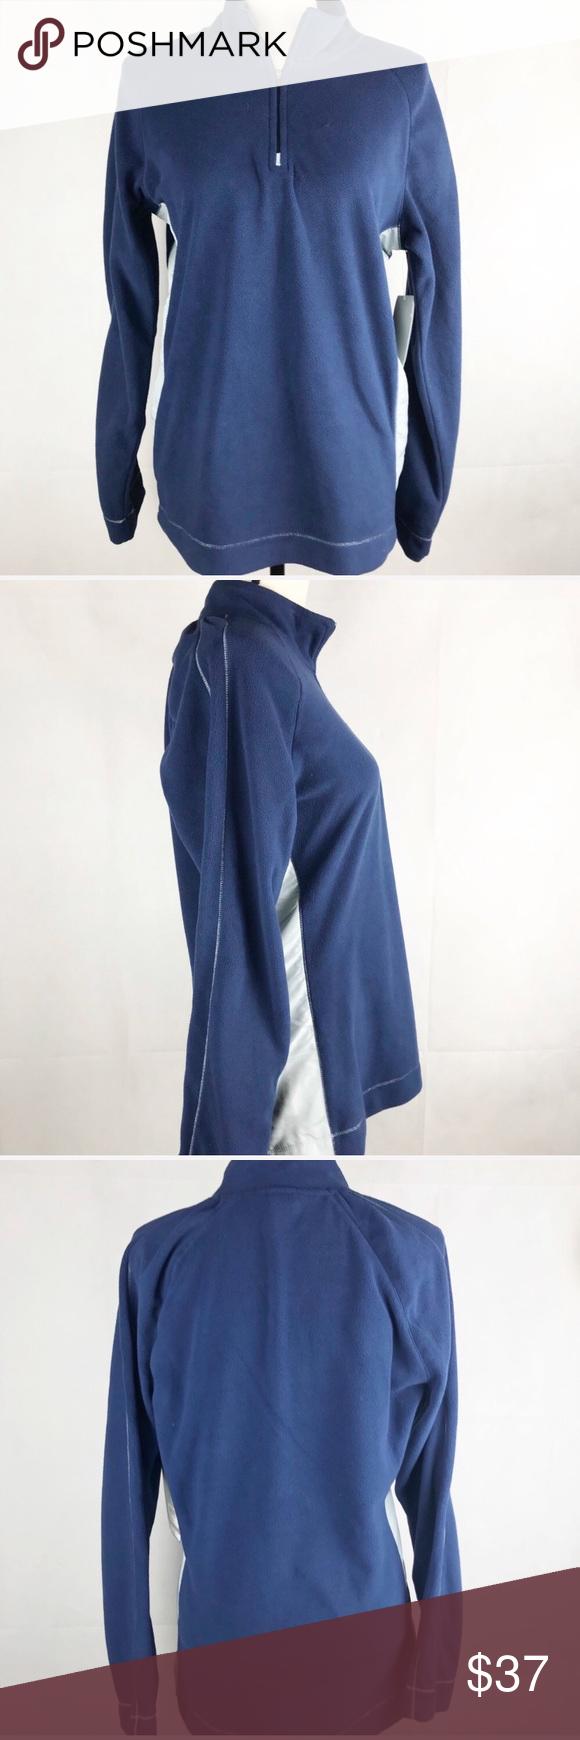 Alo Air Land Ocean Fleece Zip Blue Fleece Pullover NWT in My